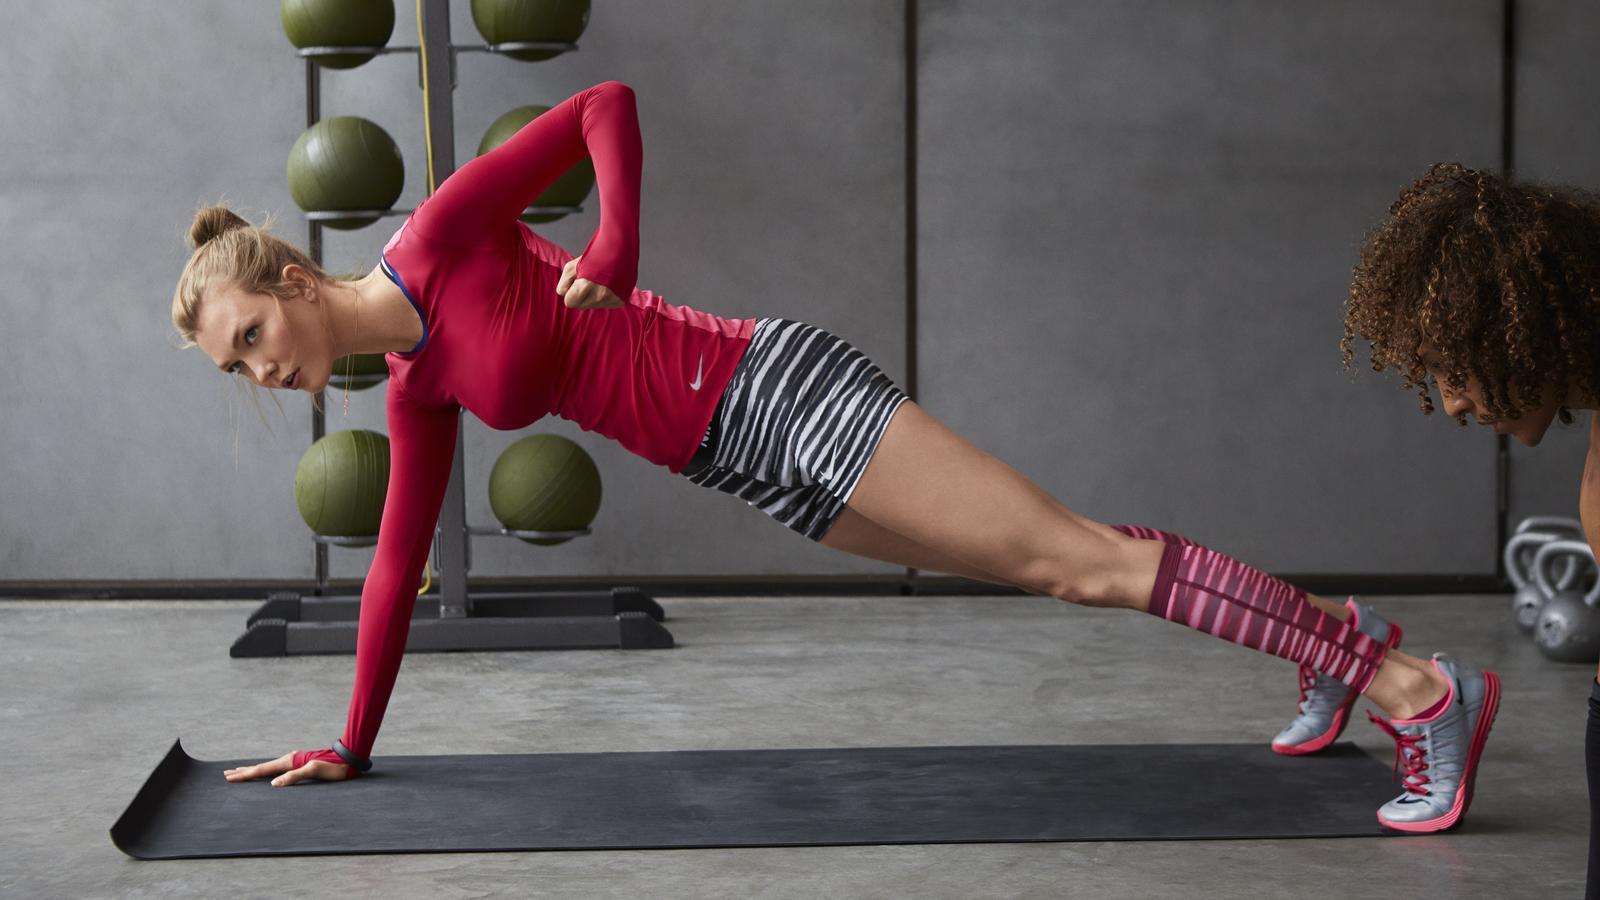 Performance Meets Style  Fall 2014 Nike Women s Apparel - Nike News 1587067ff